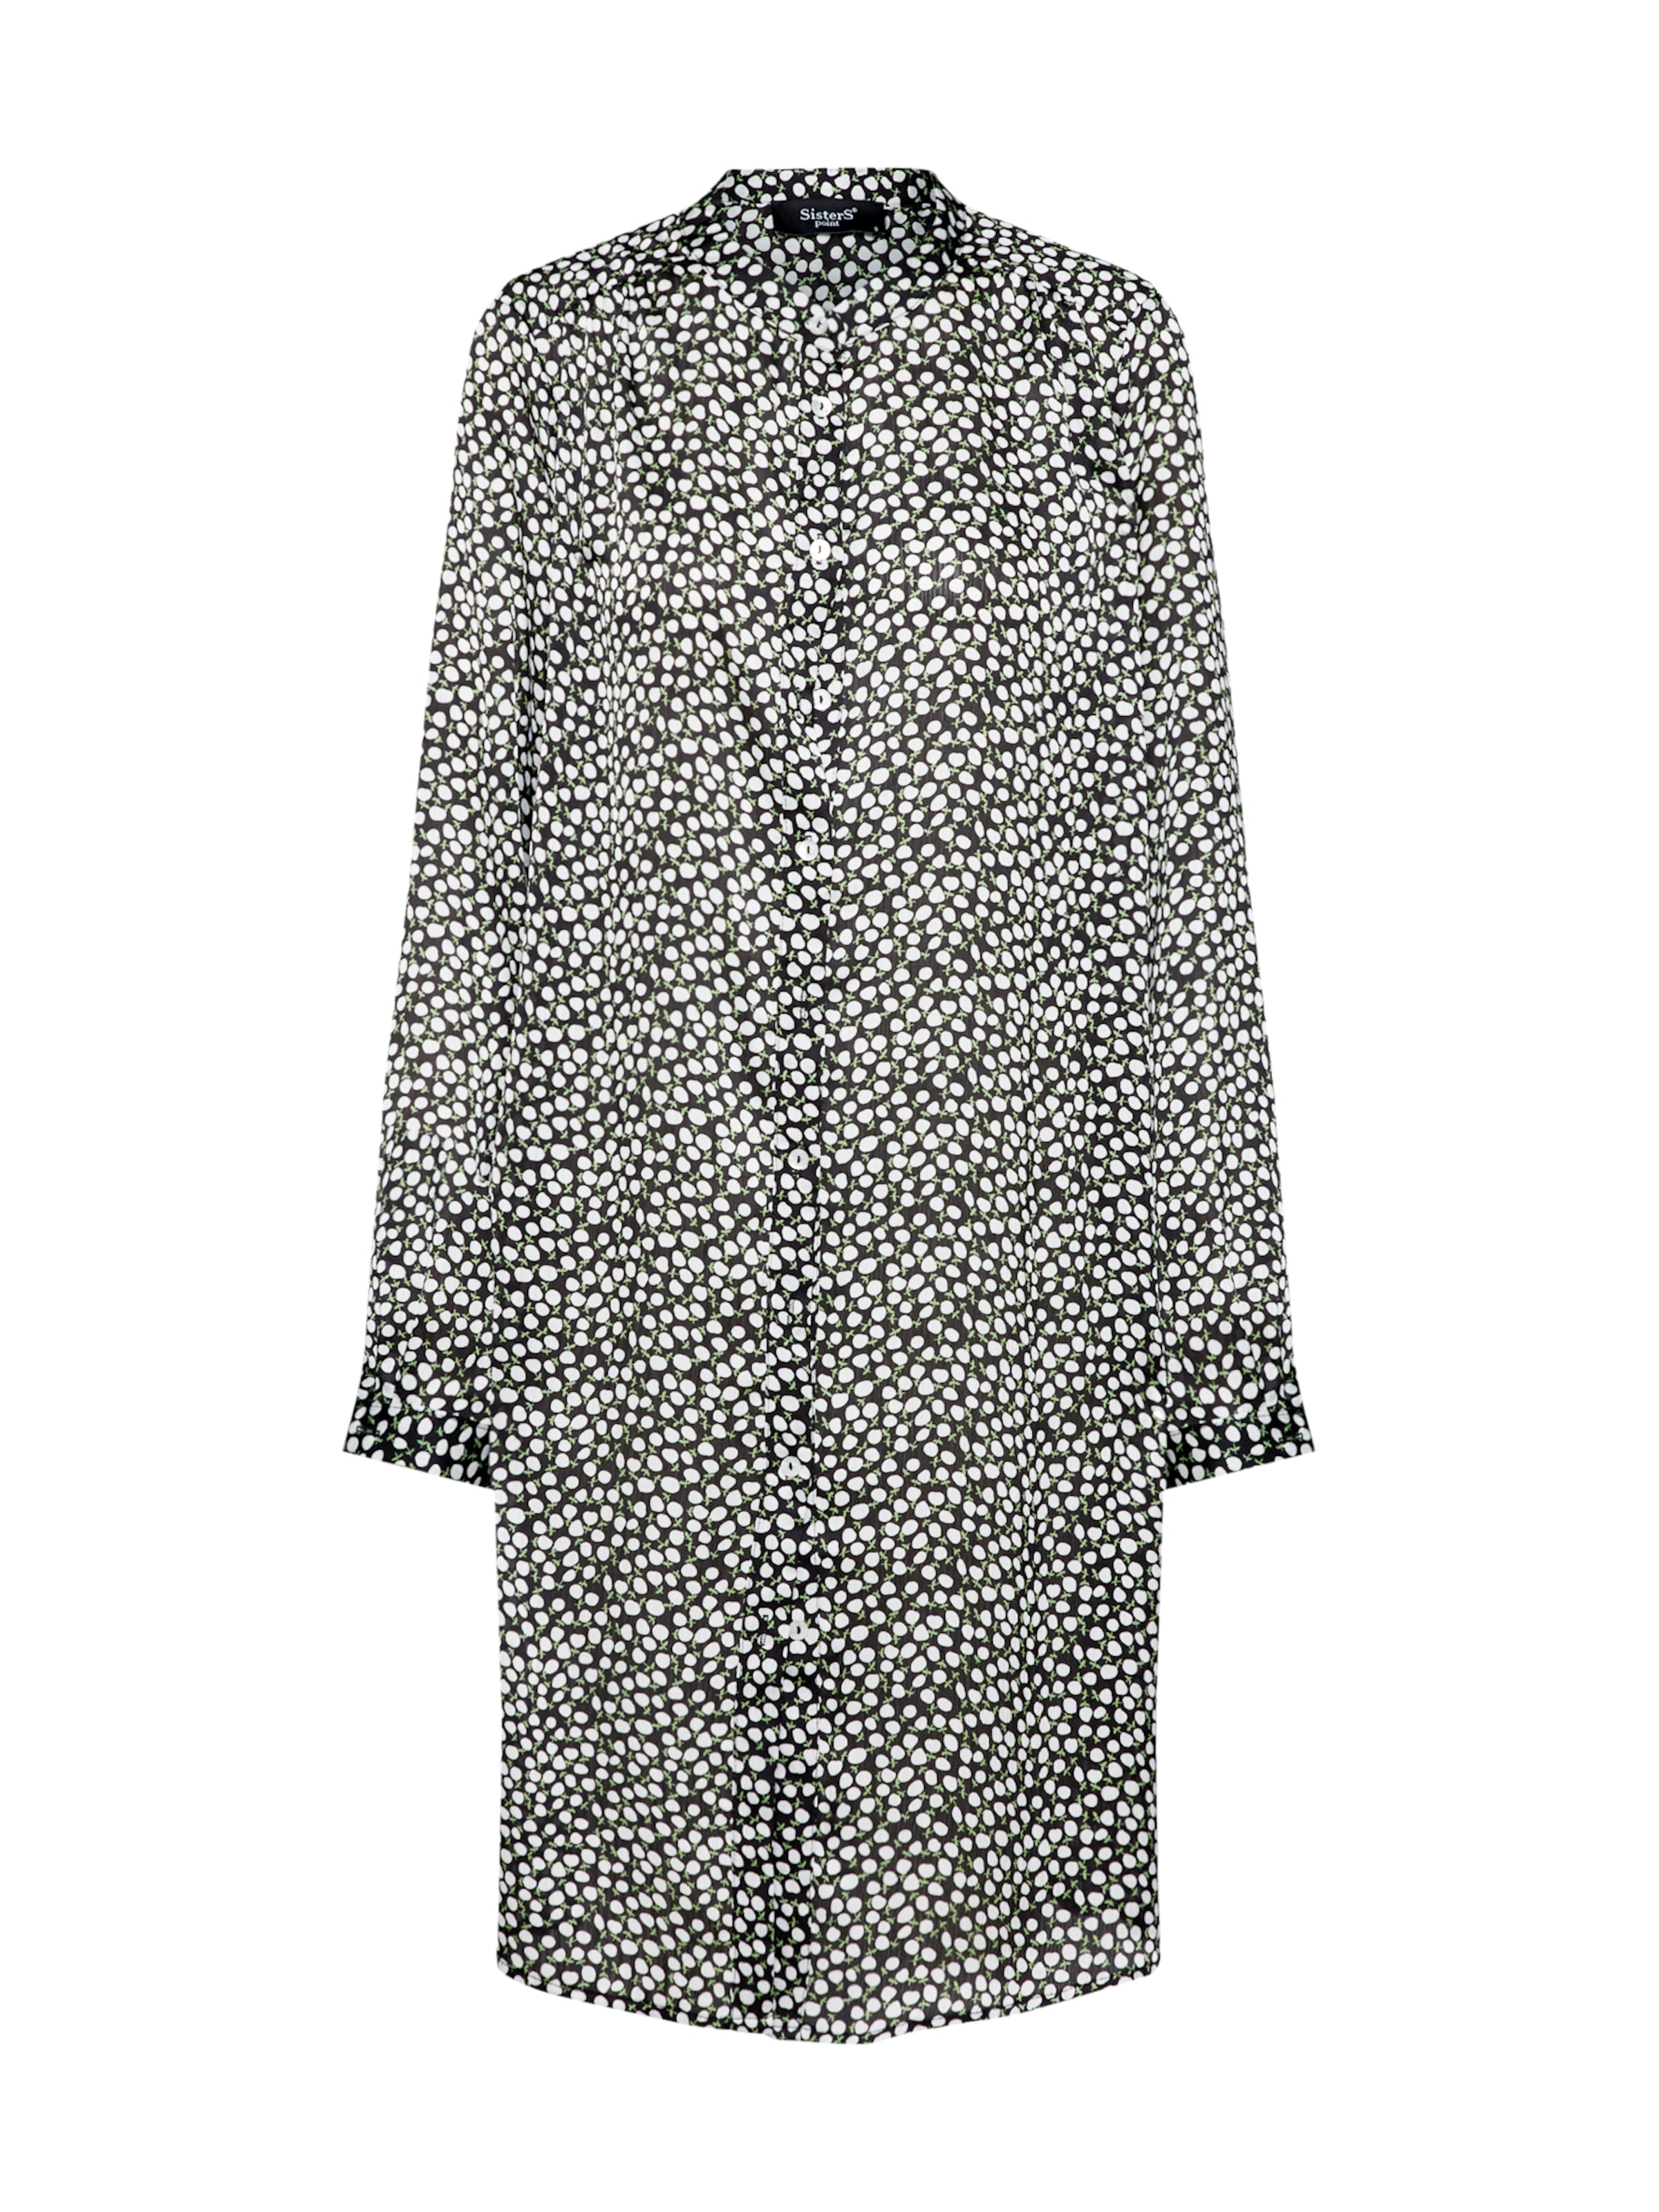 En Sisters 'valsi BeigeNoir chemise Point dr7' Robe dxeWQroCB